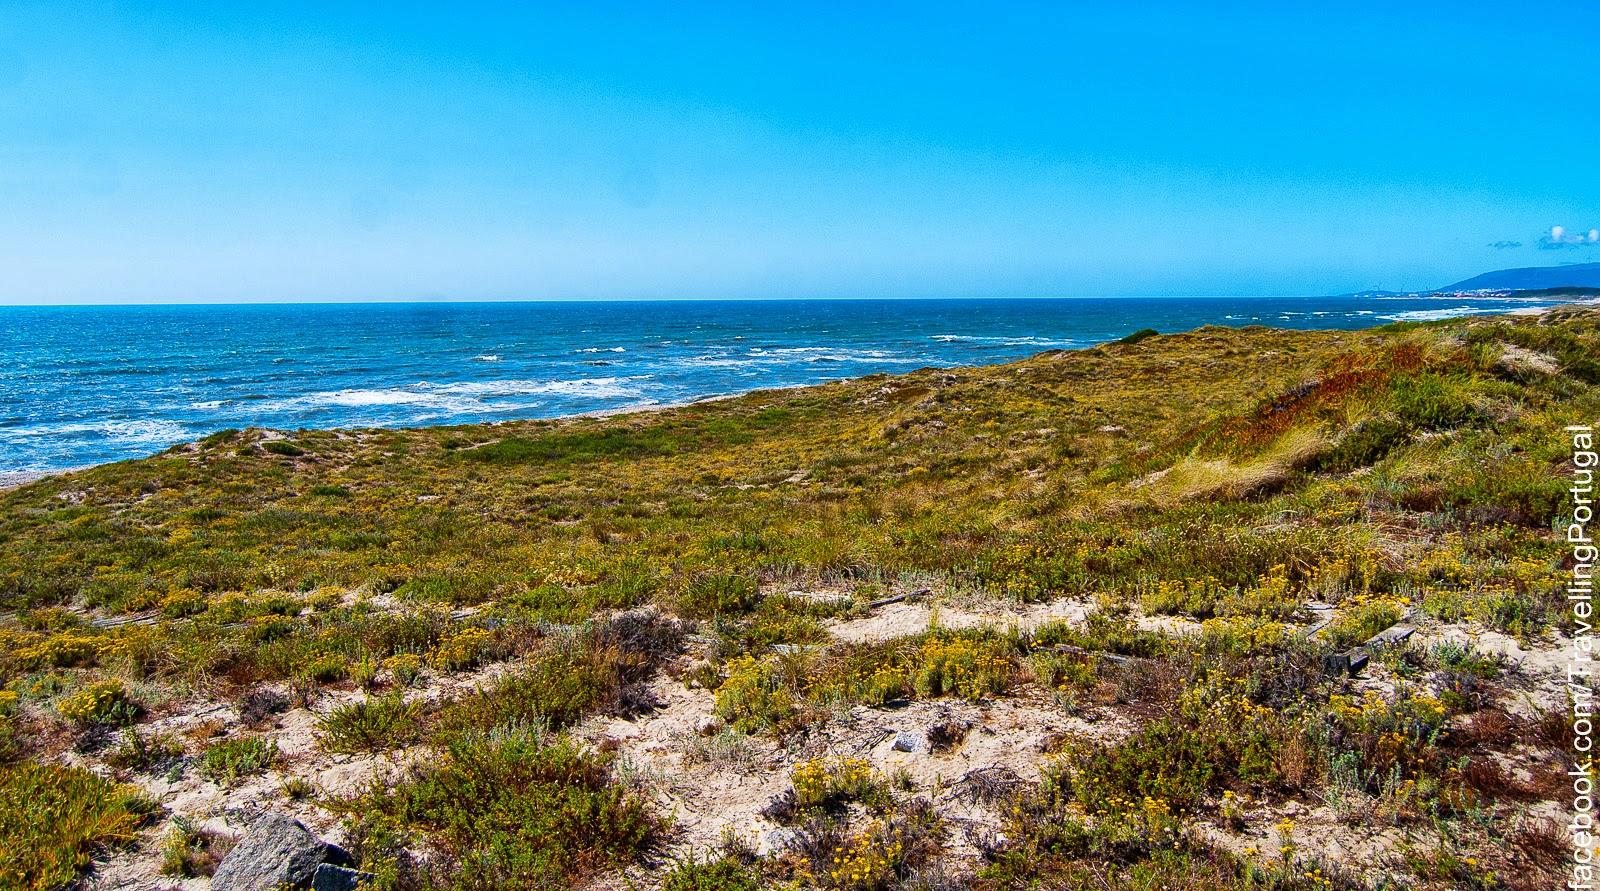 Parque natural do litoral norte turismo en portugal - Natura portugal ...